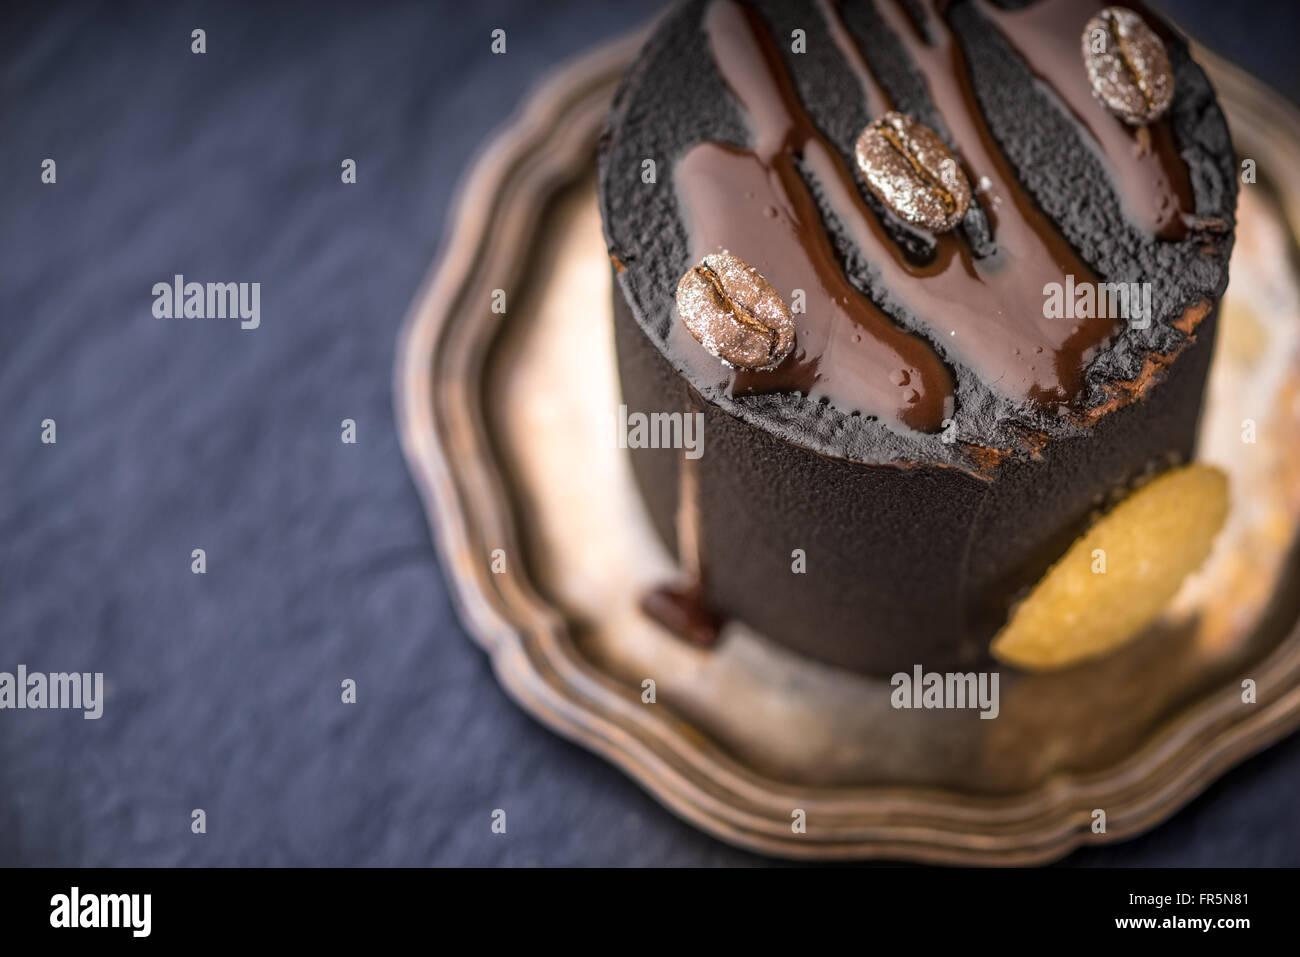 Chocolate mousse on vintage plate horizontal - Stock Image